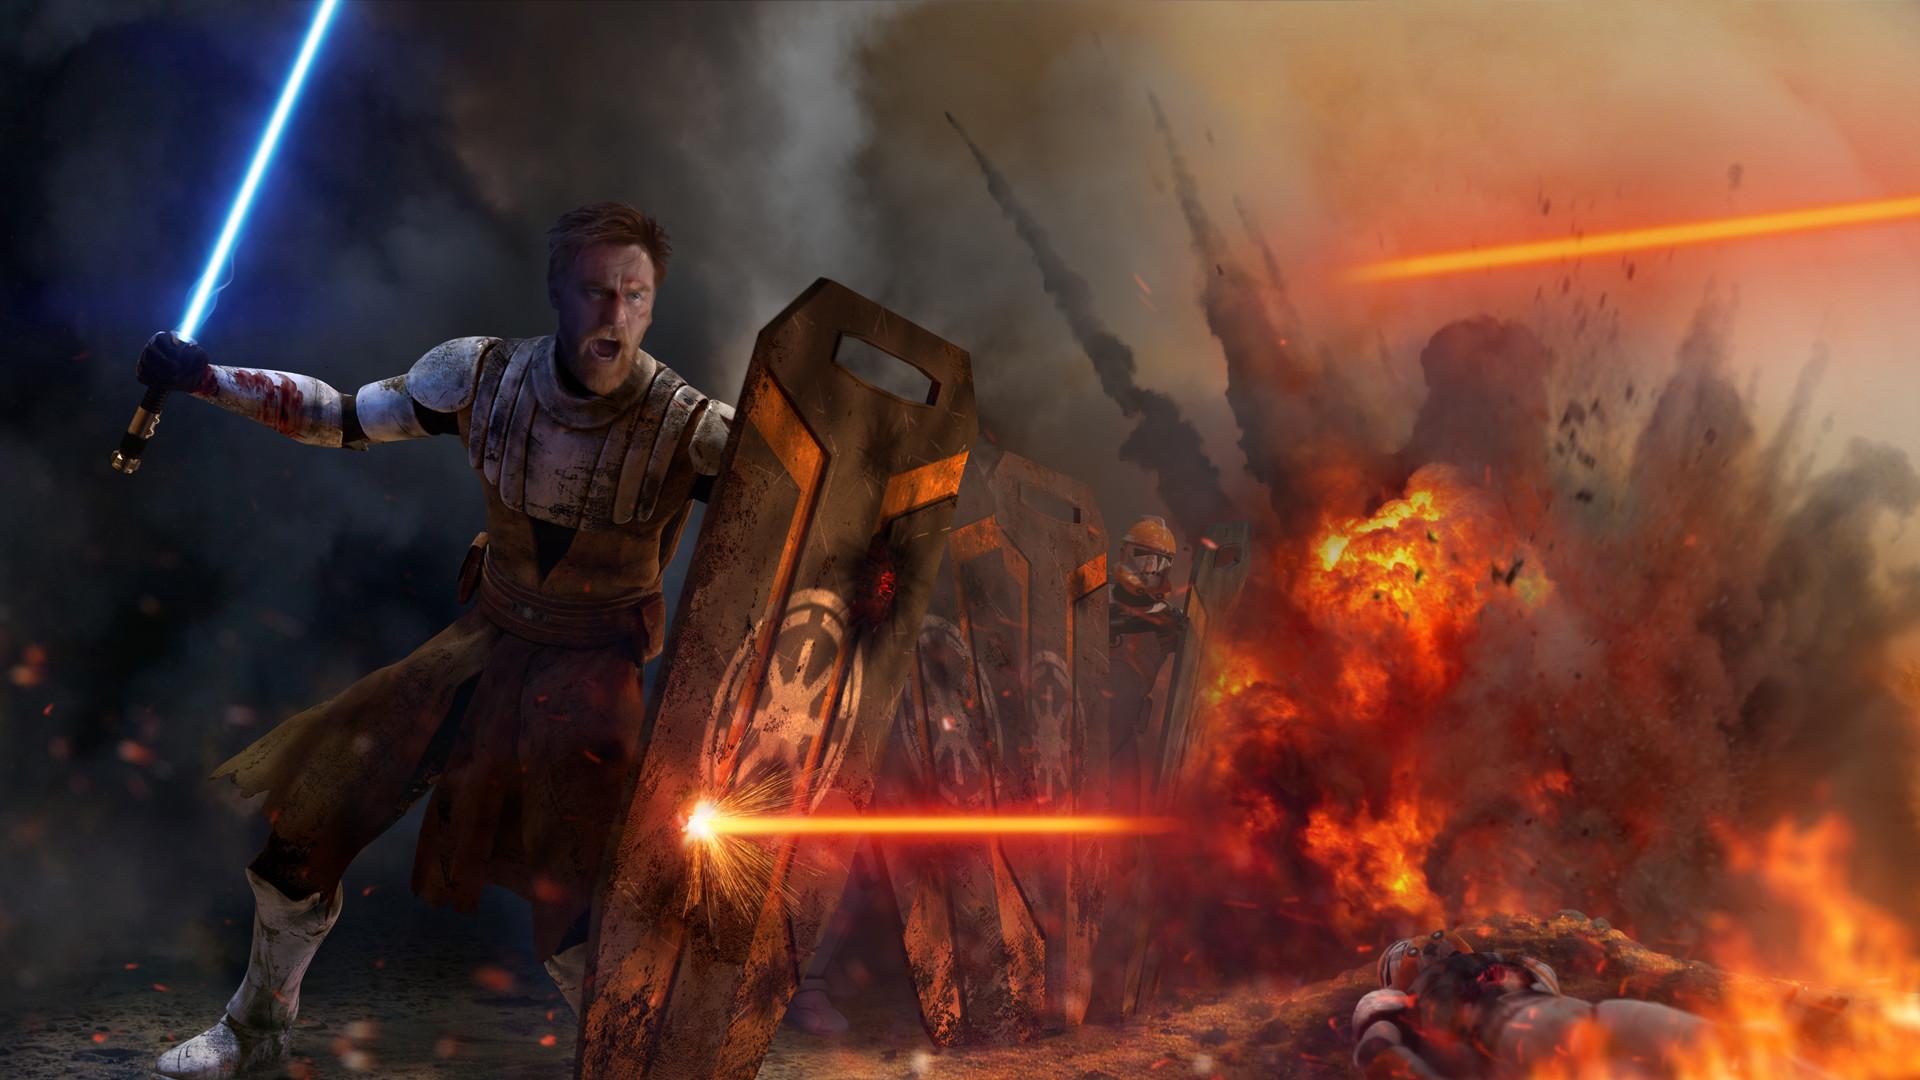 … Star Wars – Peacekeeper (Obi-Wan Kenobi) by thetechromancer